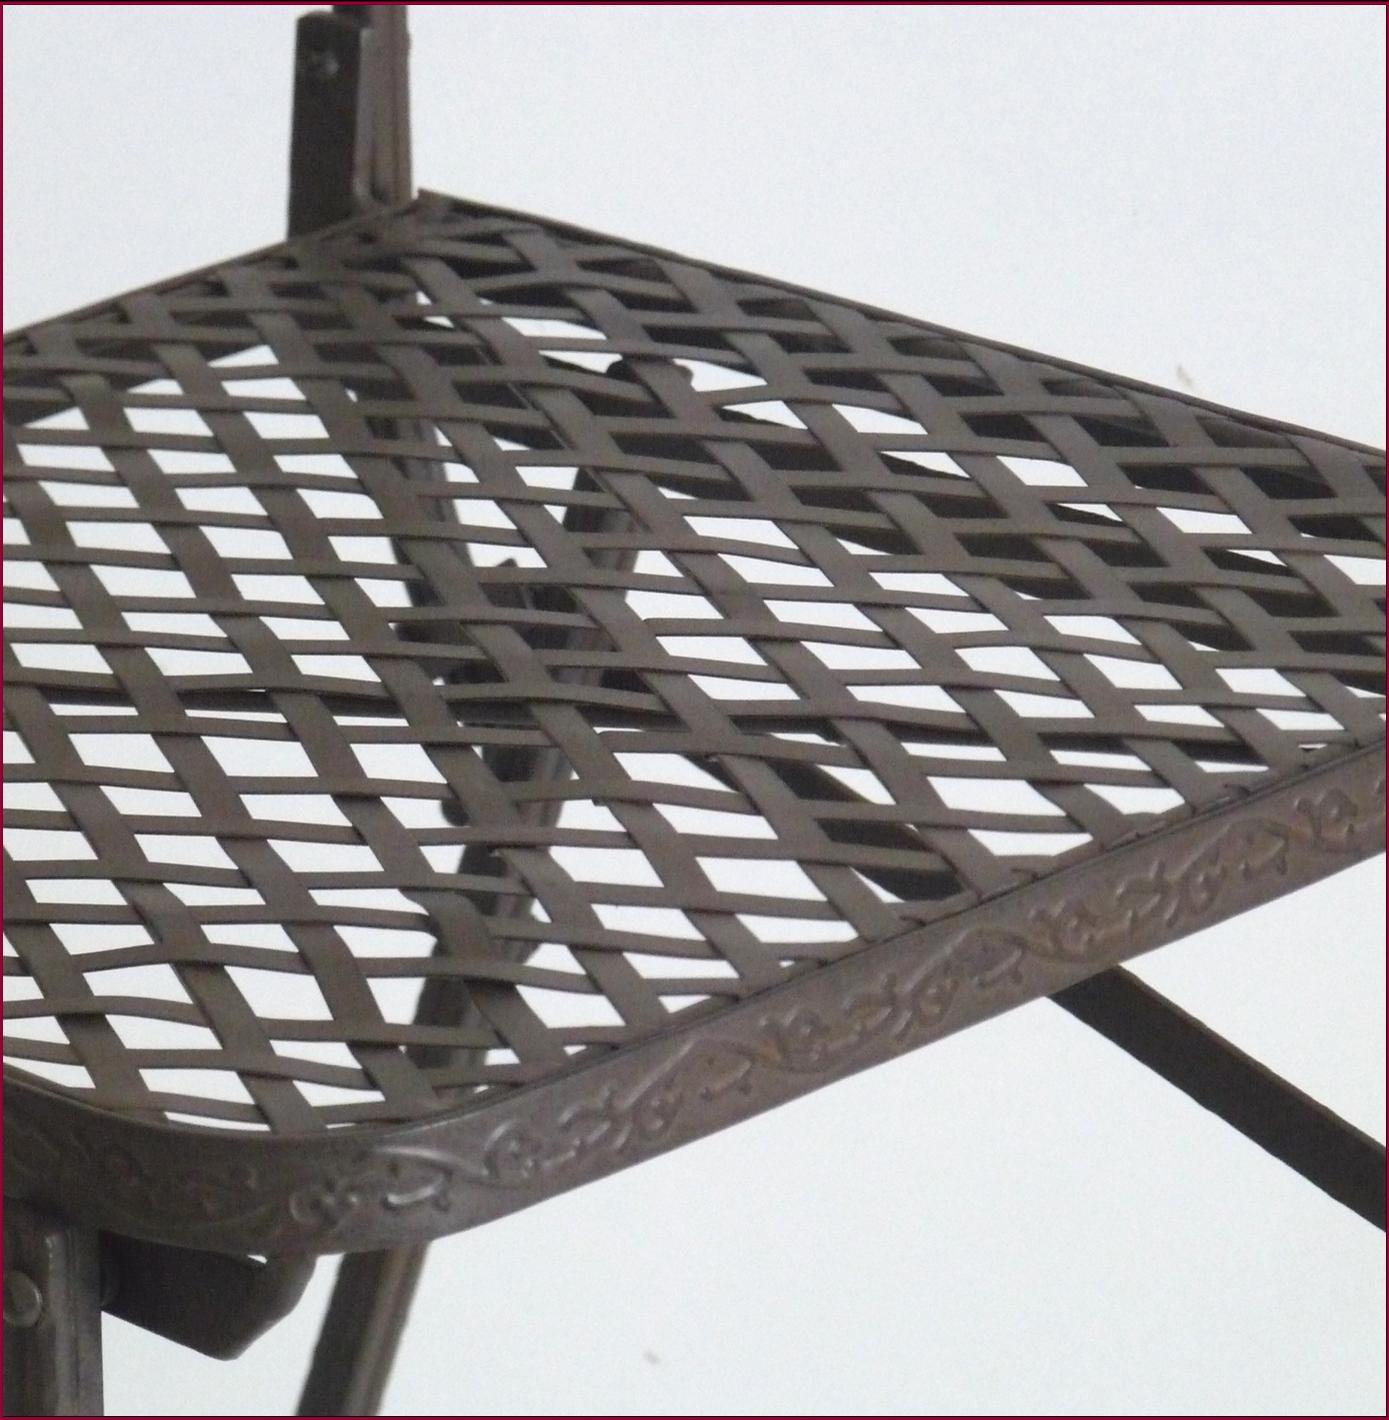 Chaise bar de bar de comptoir chaise haute en fer forge - Chaise haute fer forge ...